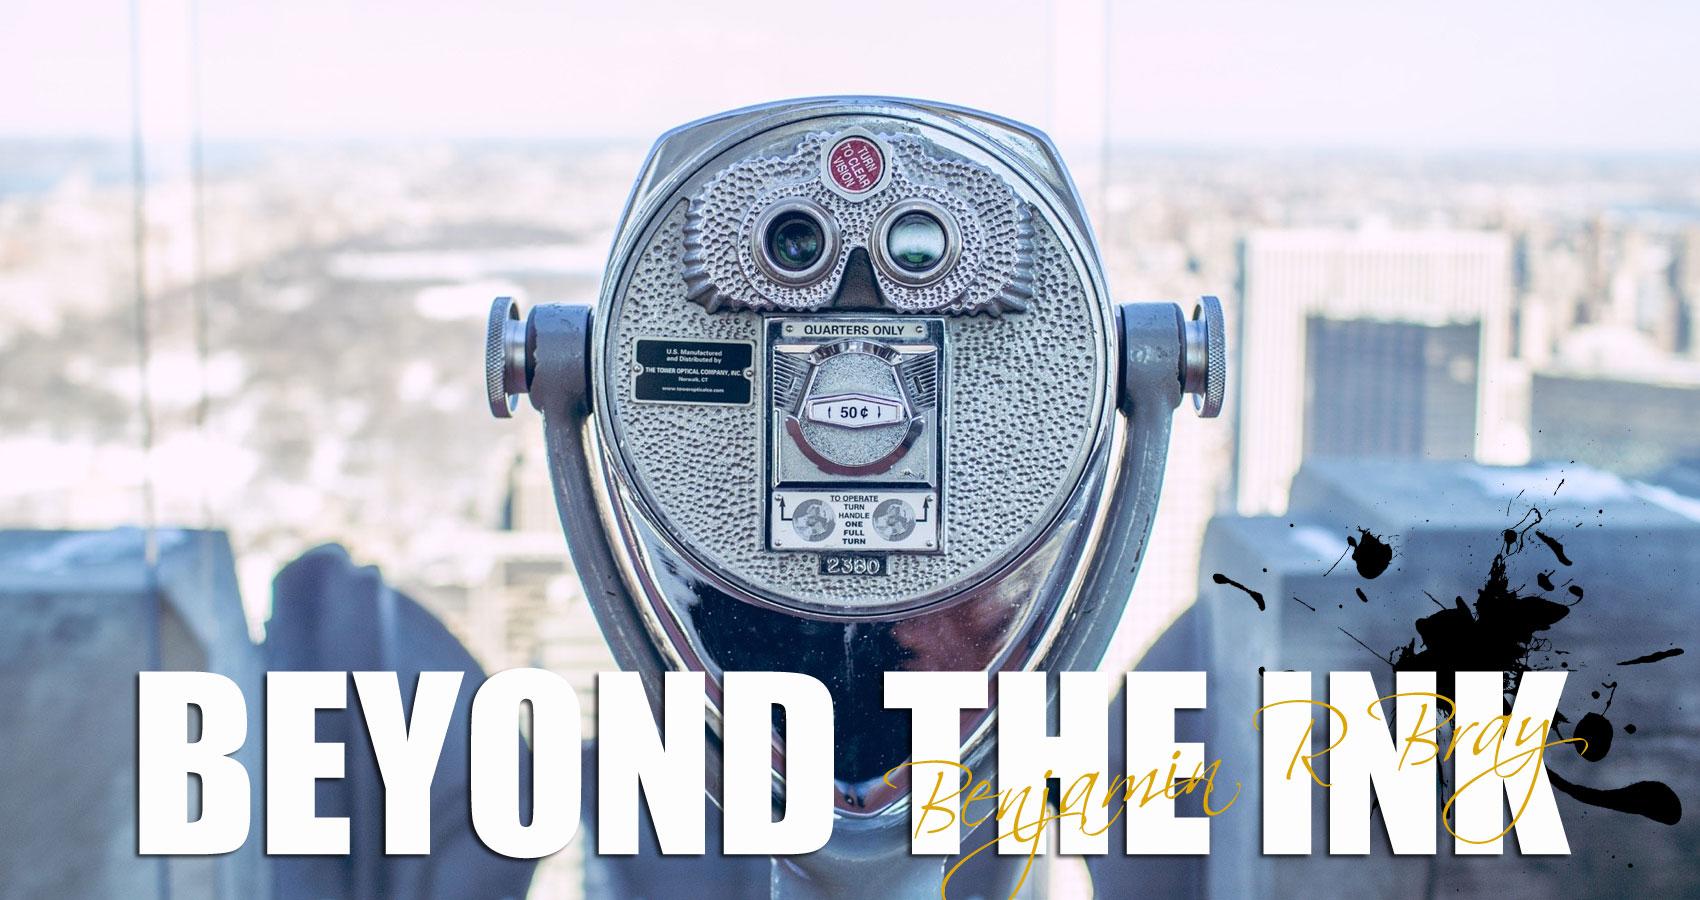 Beyond The Ink - Benjamin R Bray at Spillwords.com